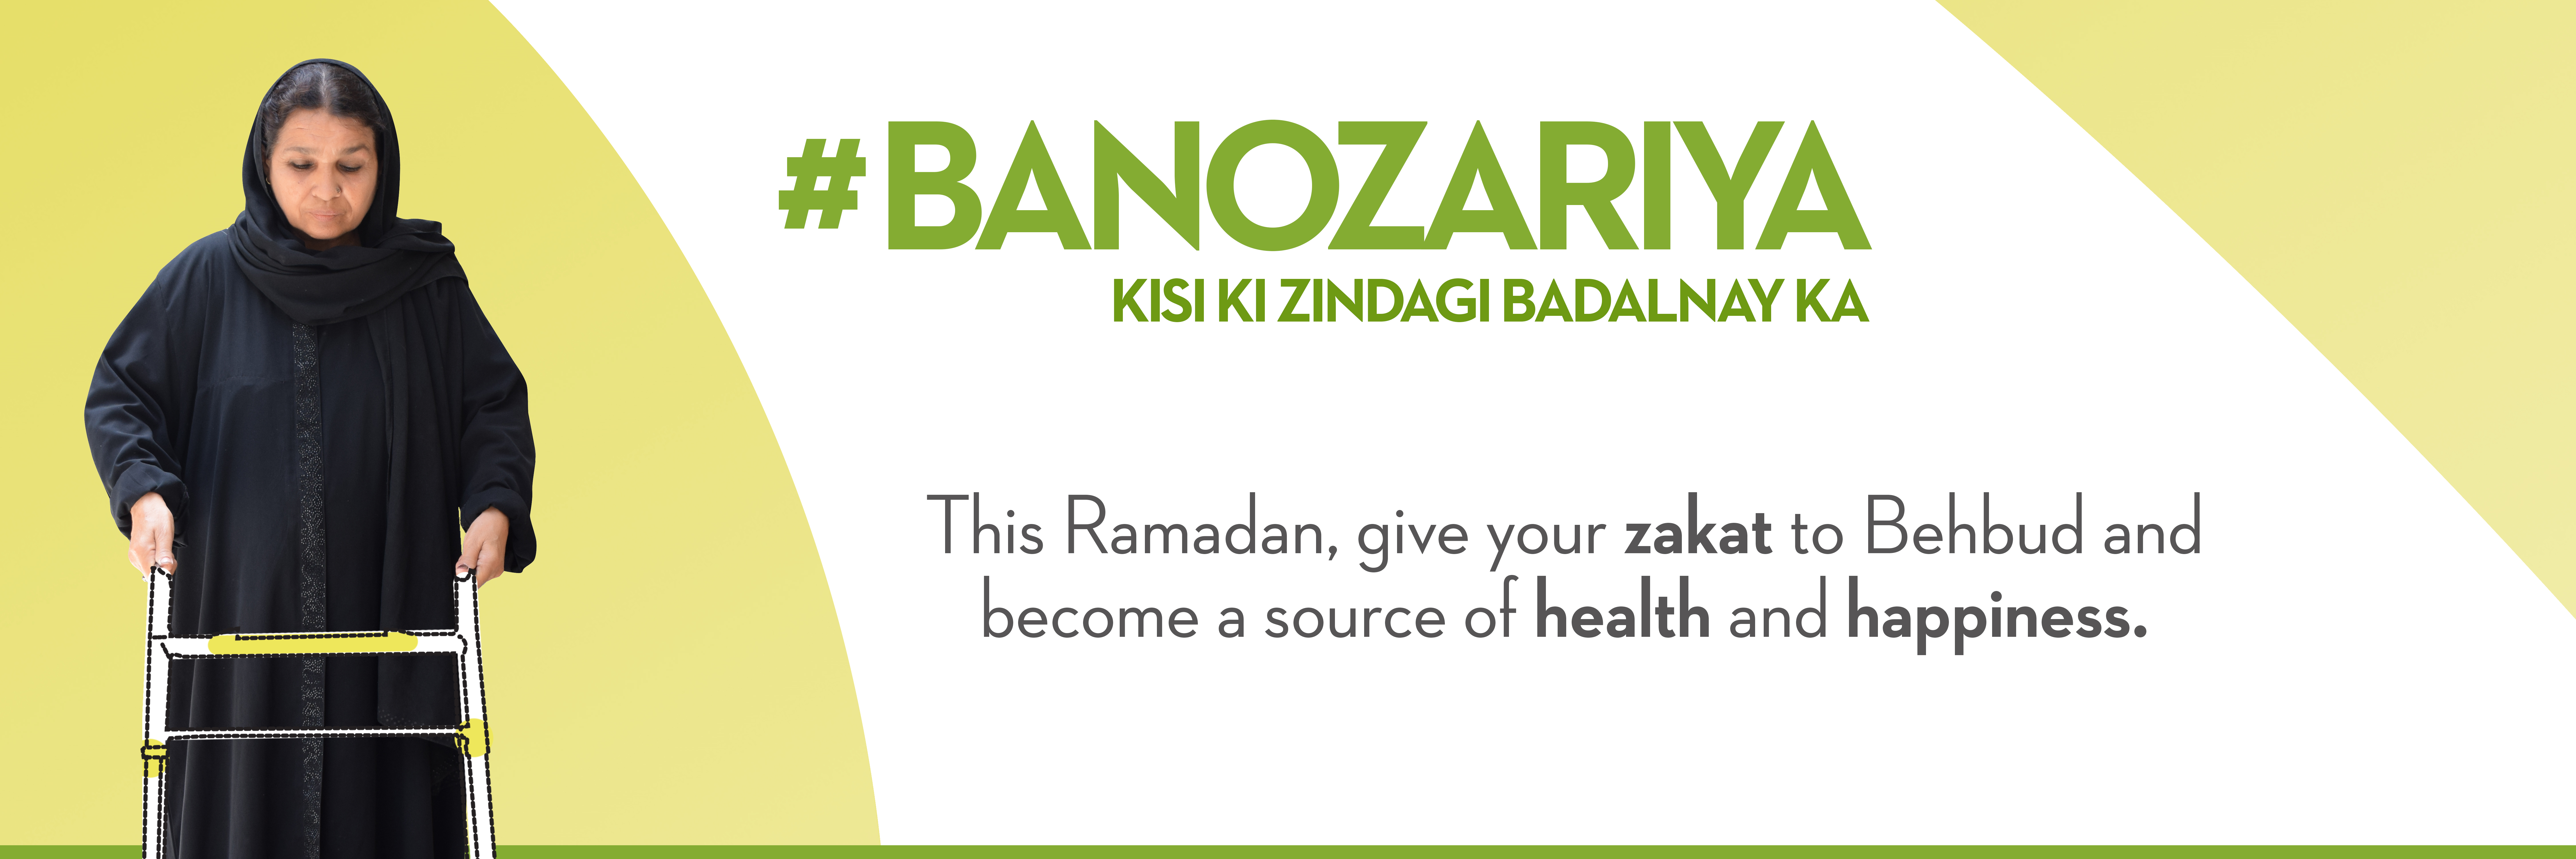 banozariya-ramadan-banner-new-3